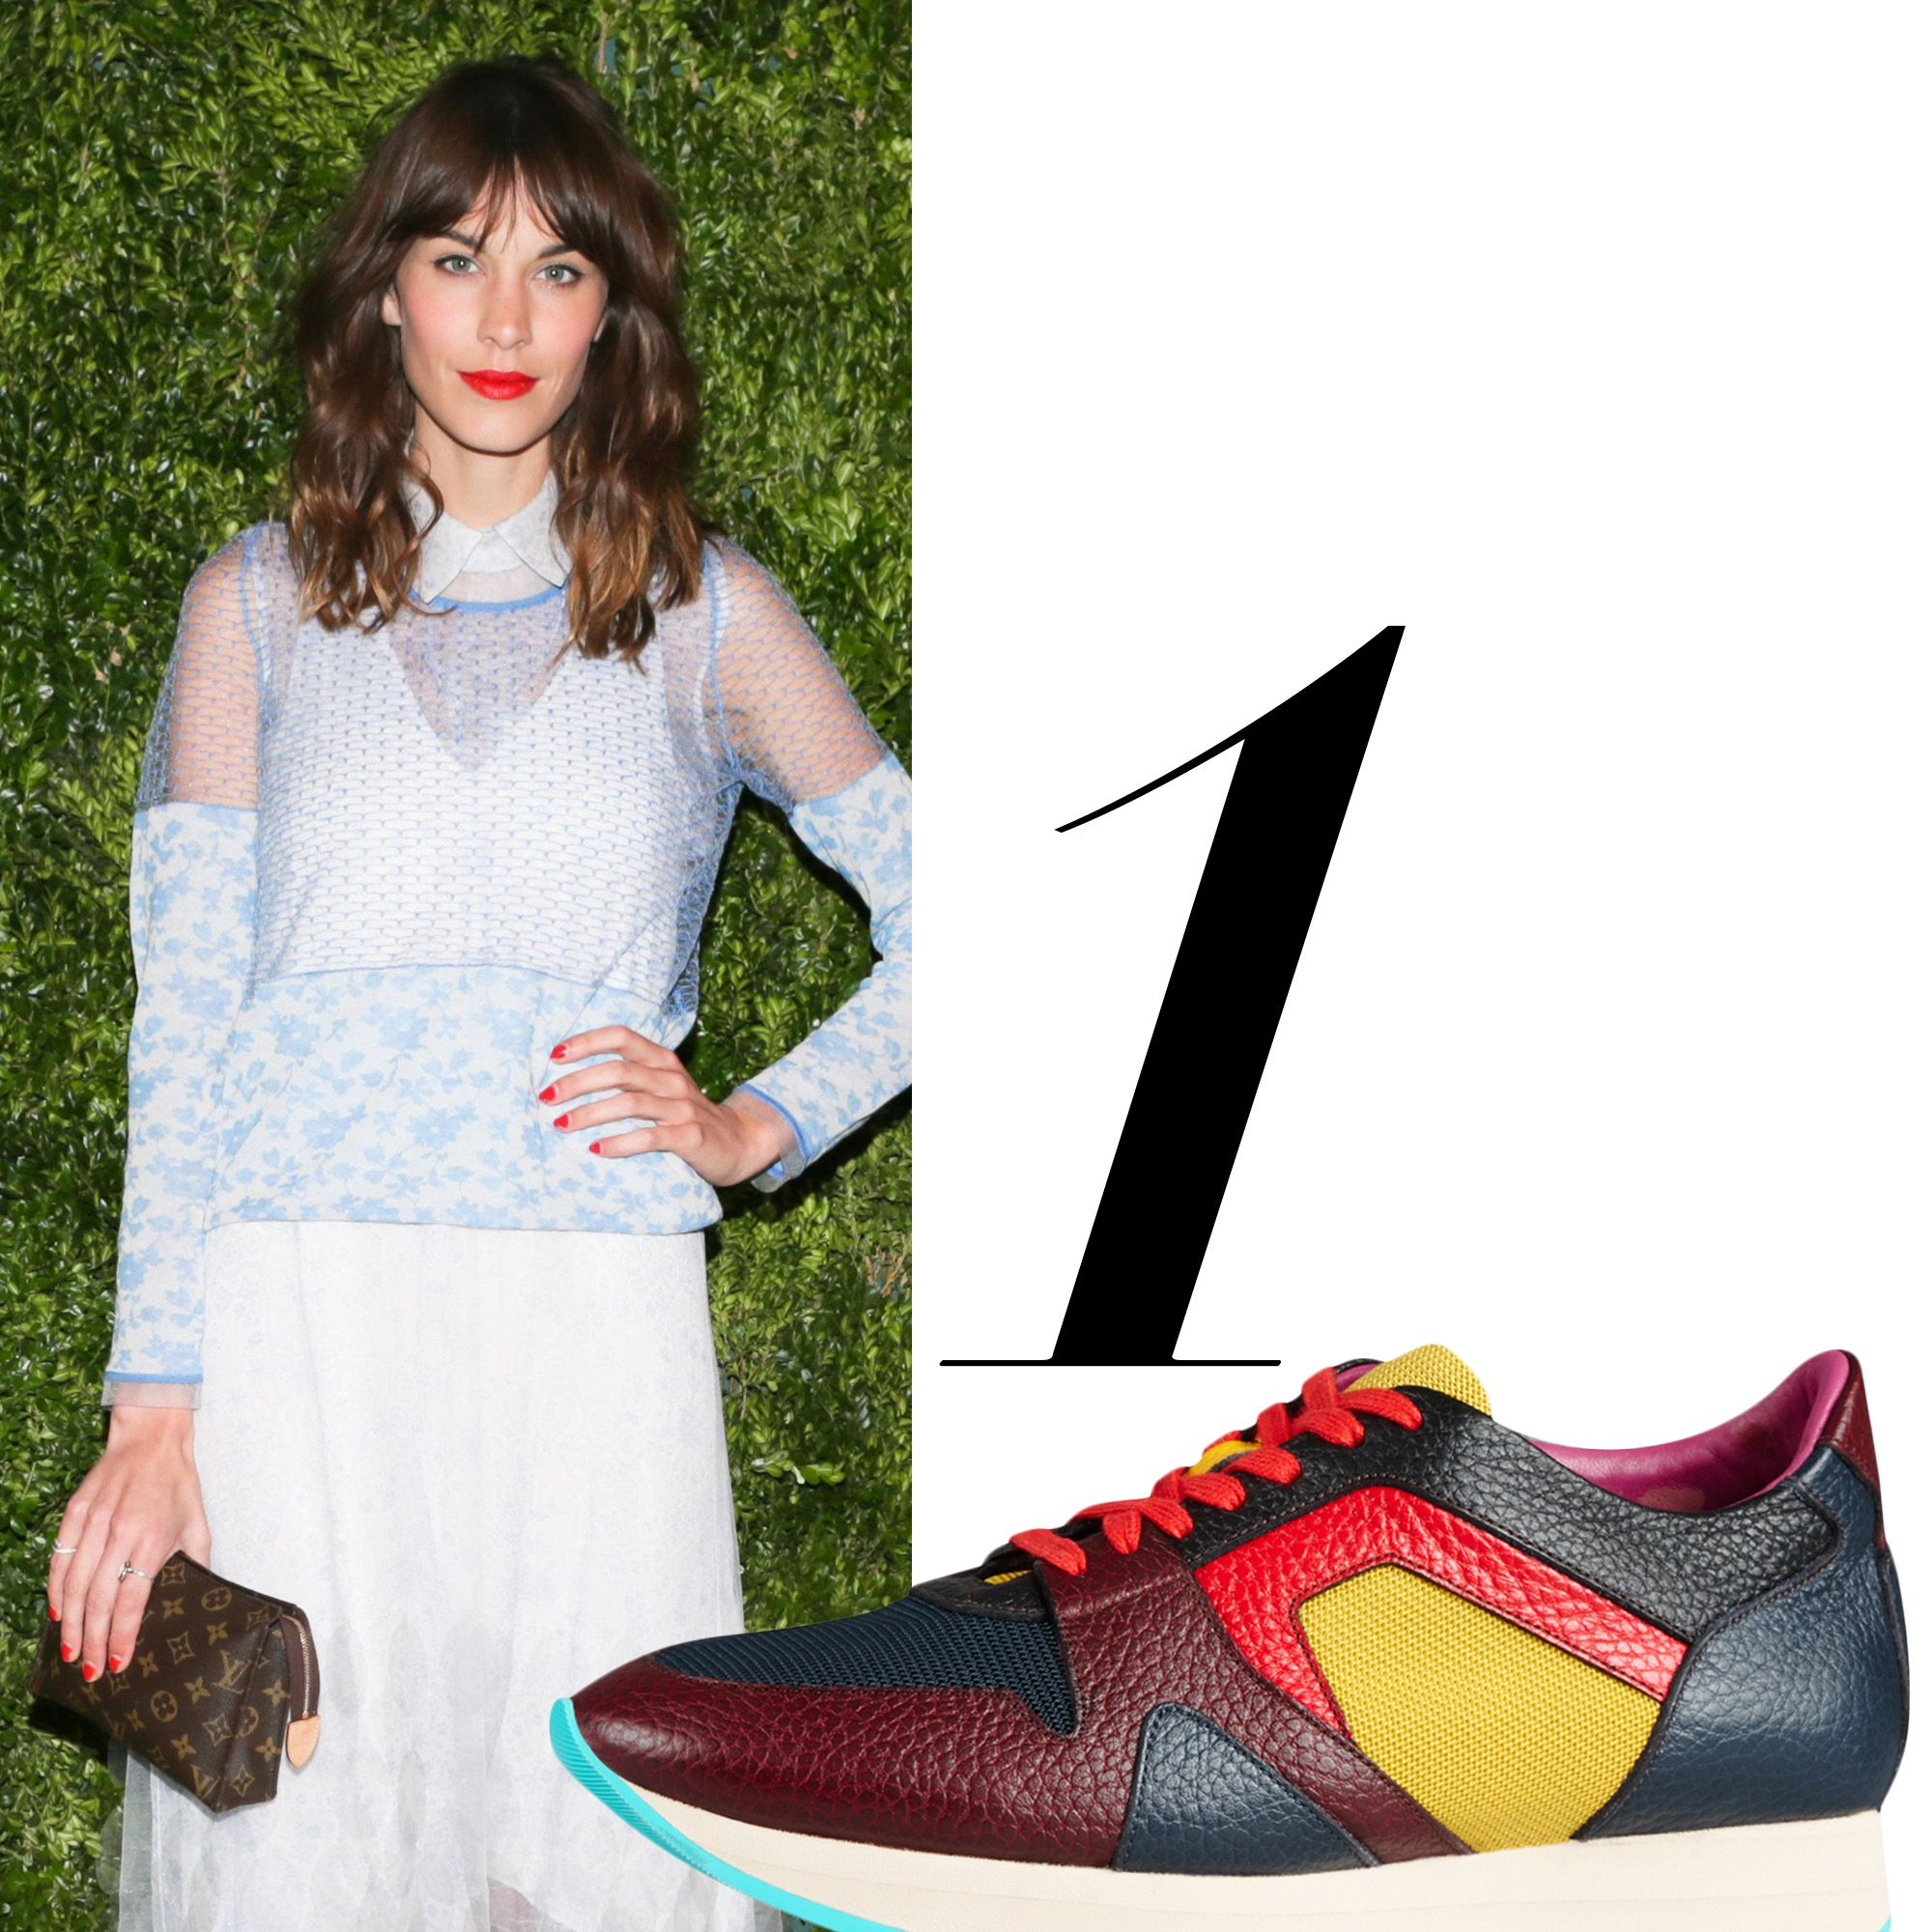 "<em>Burberry sneaker, $595, <a href=""http://us.burberry.com/the-field-sneaker-in-colour-block-leathermesh-p39732701"" target=""_blank"">burberry.com</a>.</em>"